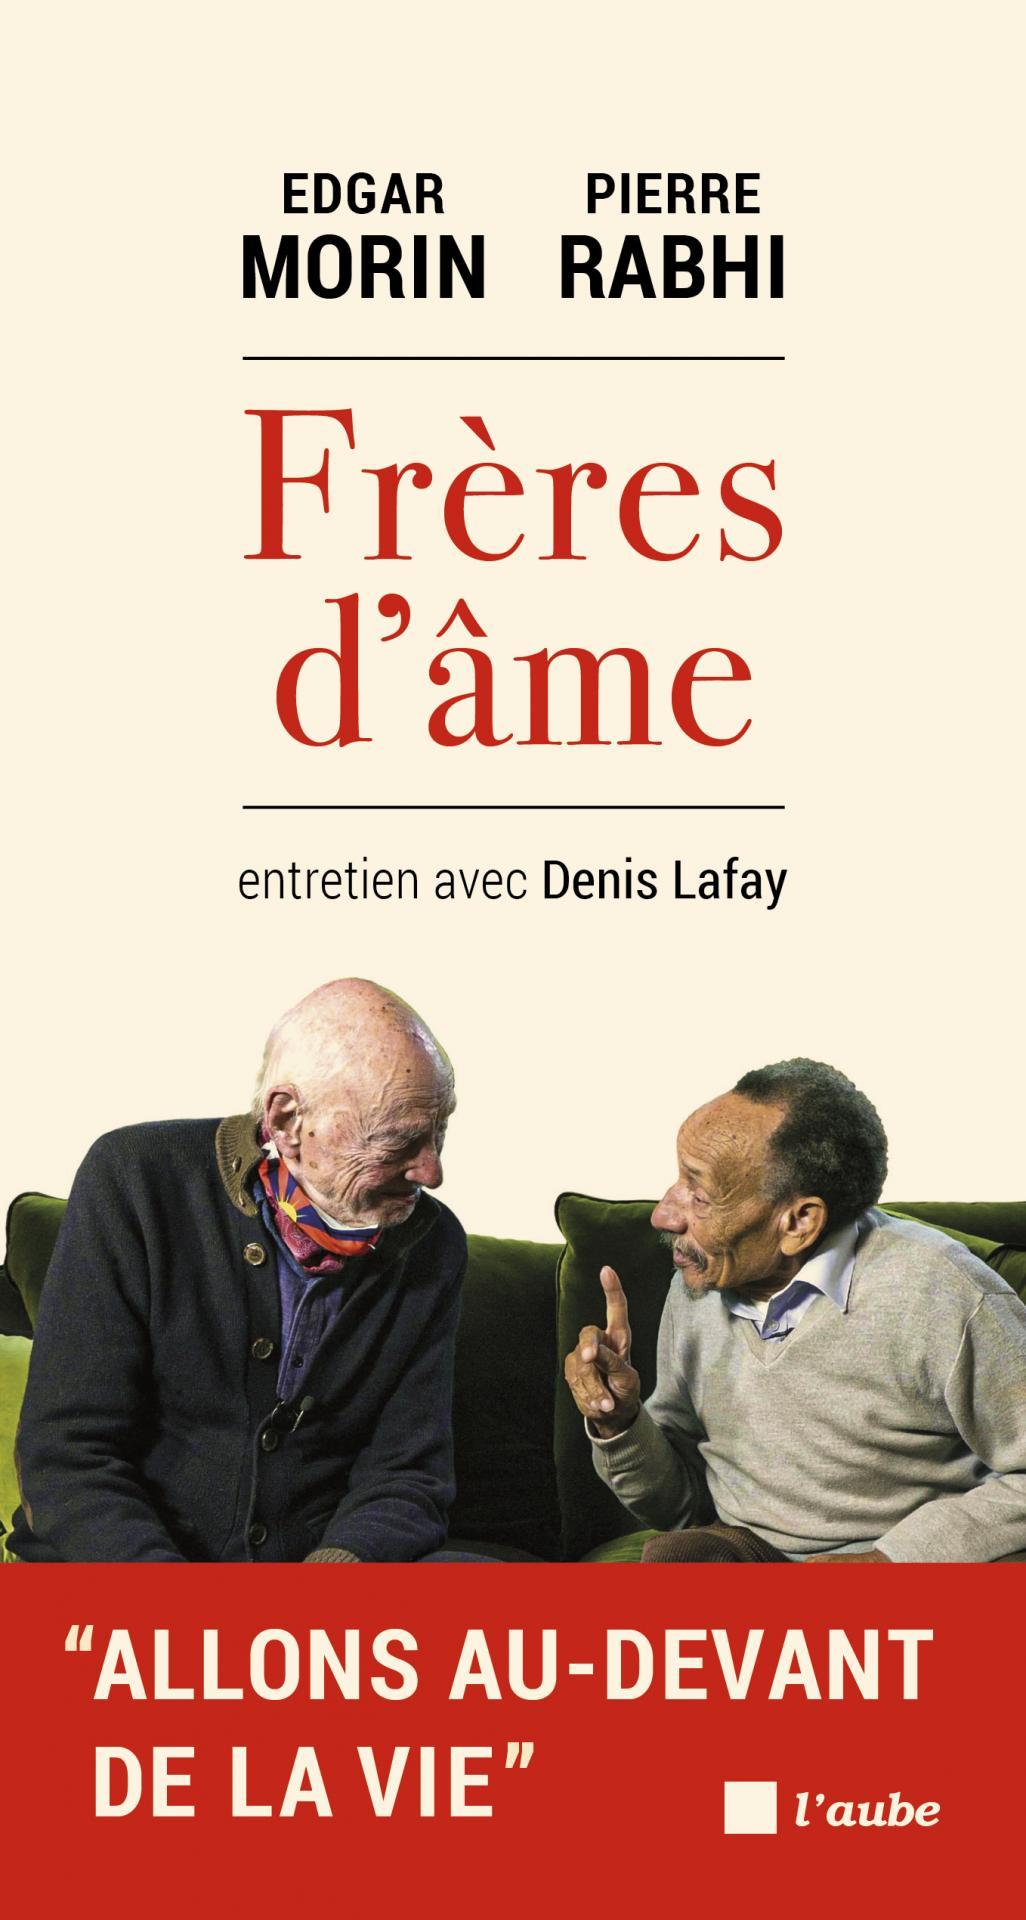 Pierre Rabhi et Edgar Morin, hymne à la vie